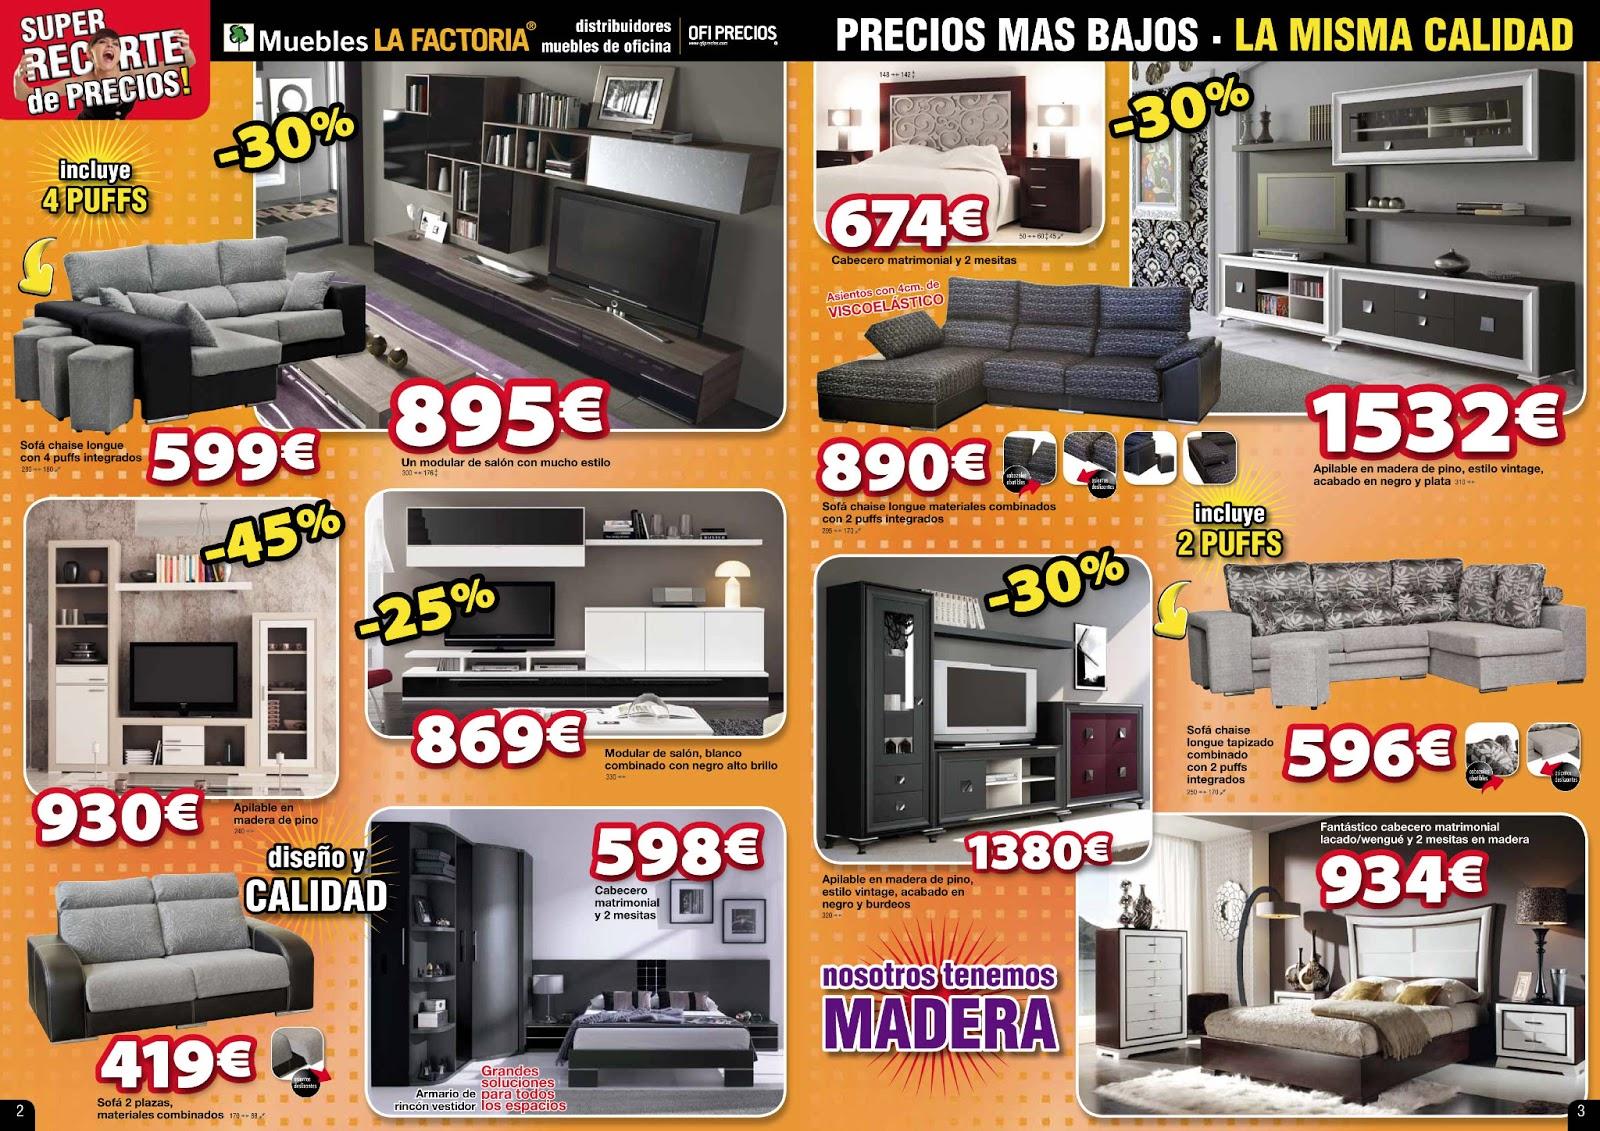 Martacorgo muebles la factoria for Muebles la factoria castellon